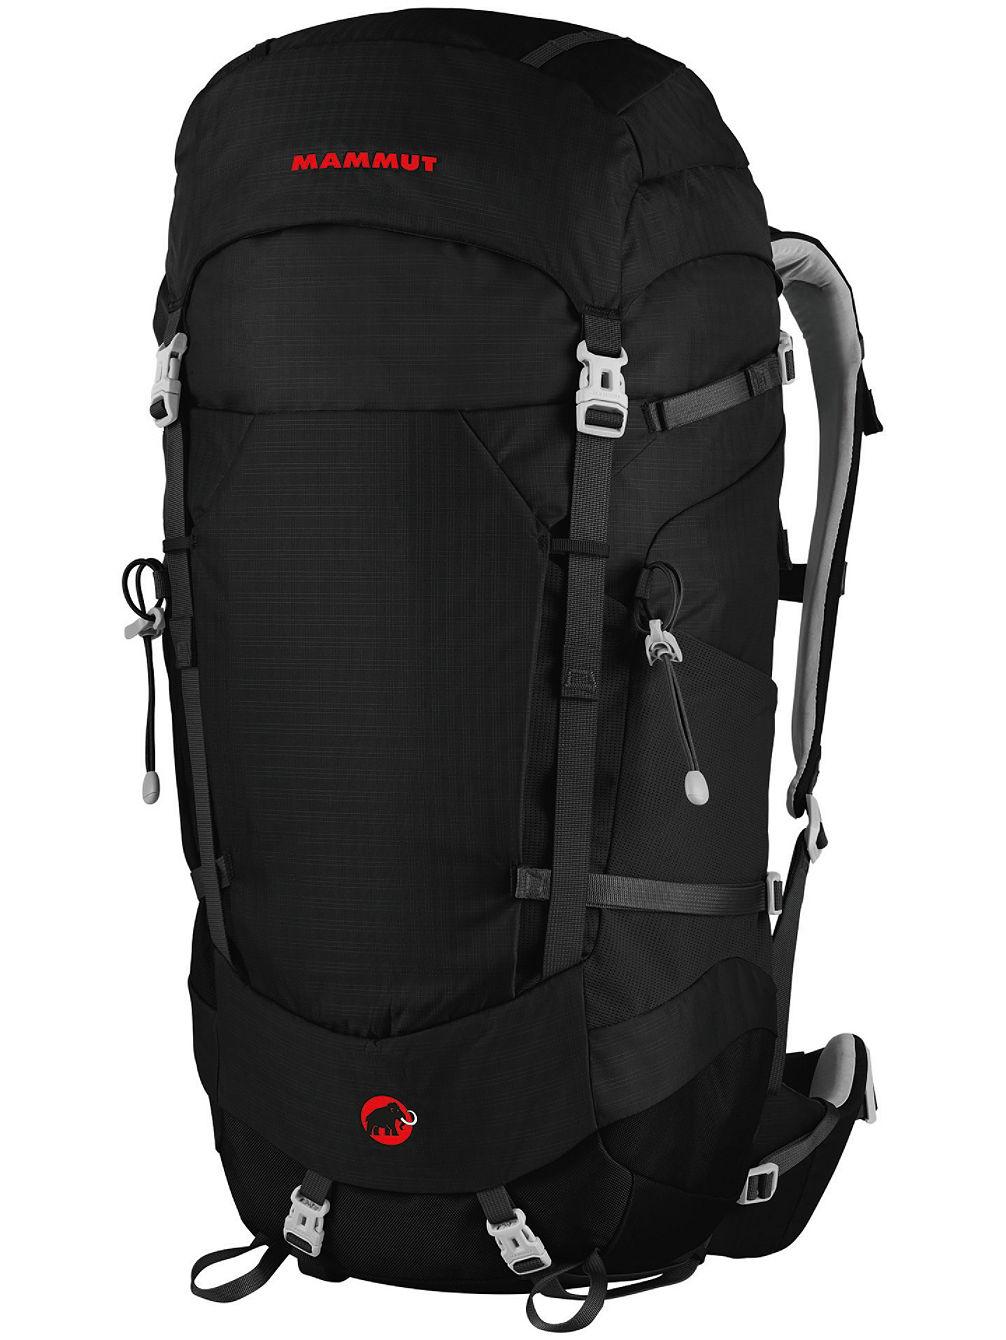 mammut-lithium-crest-507l-backpack